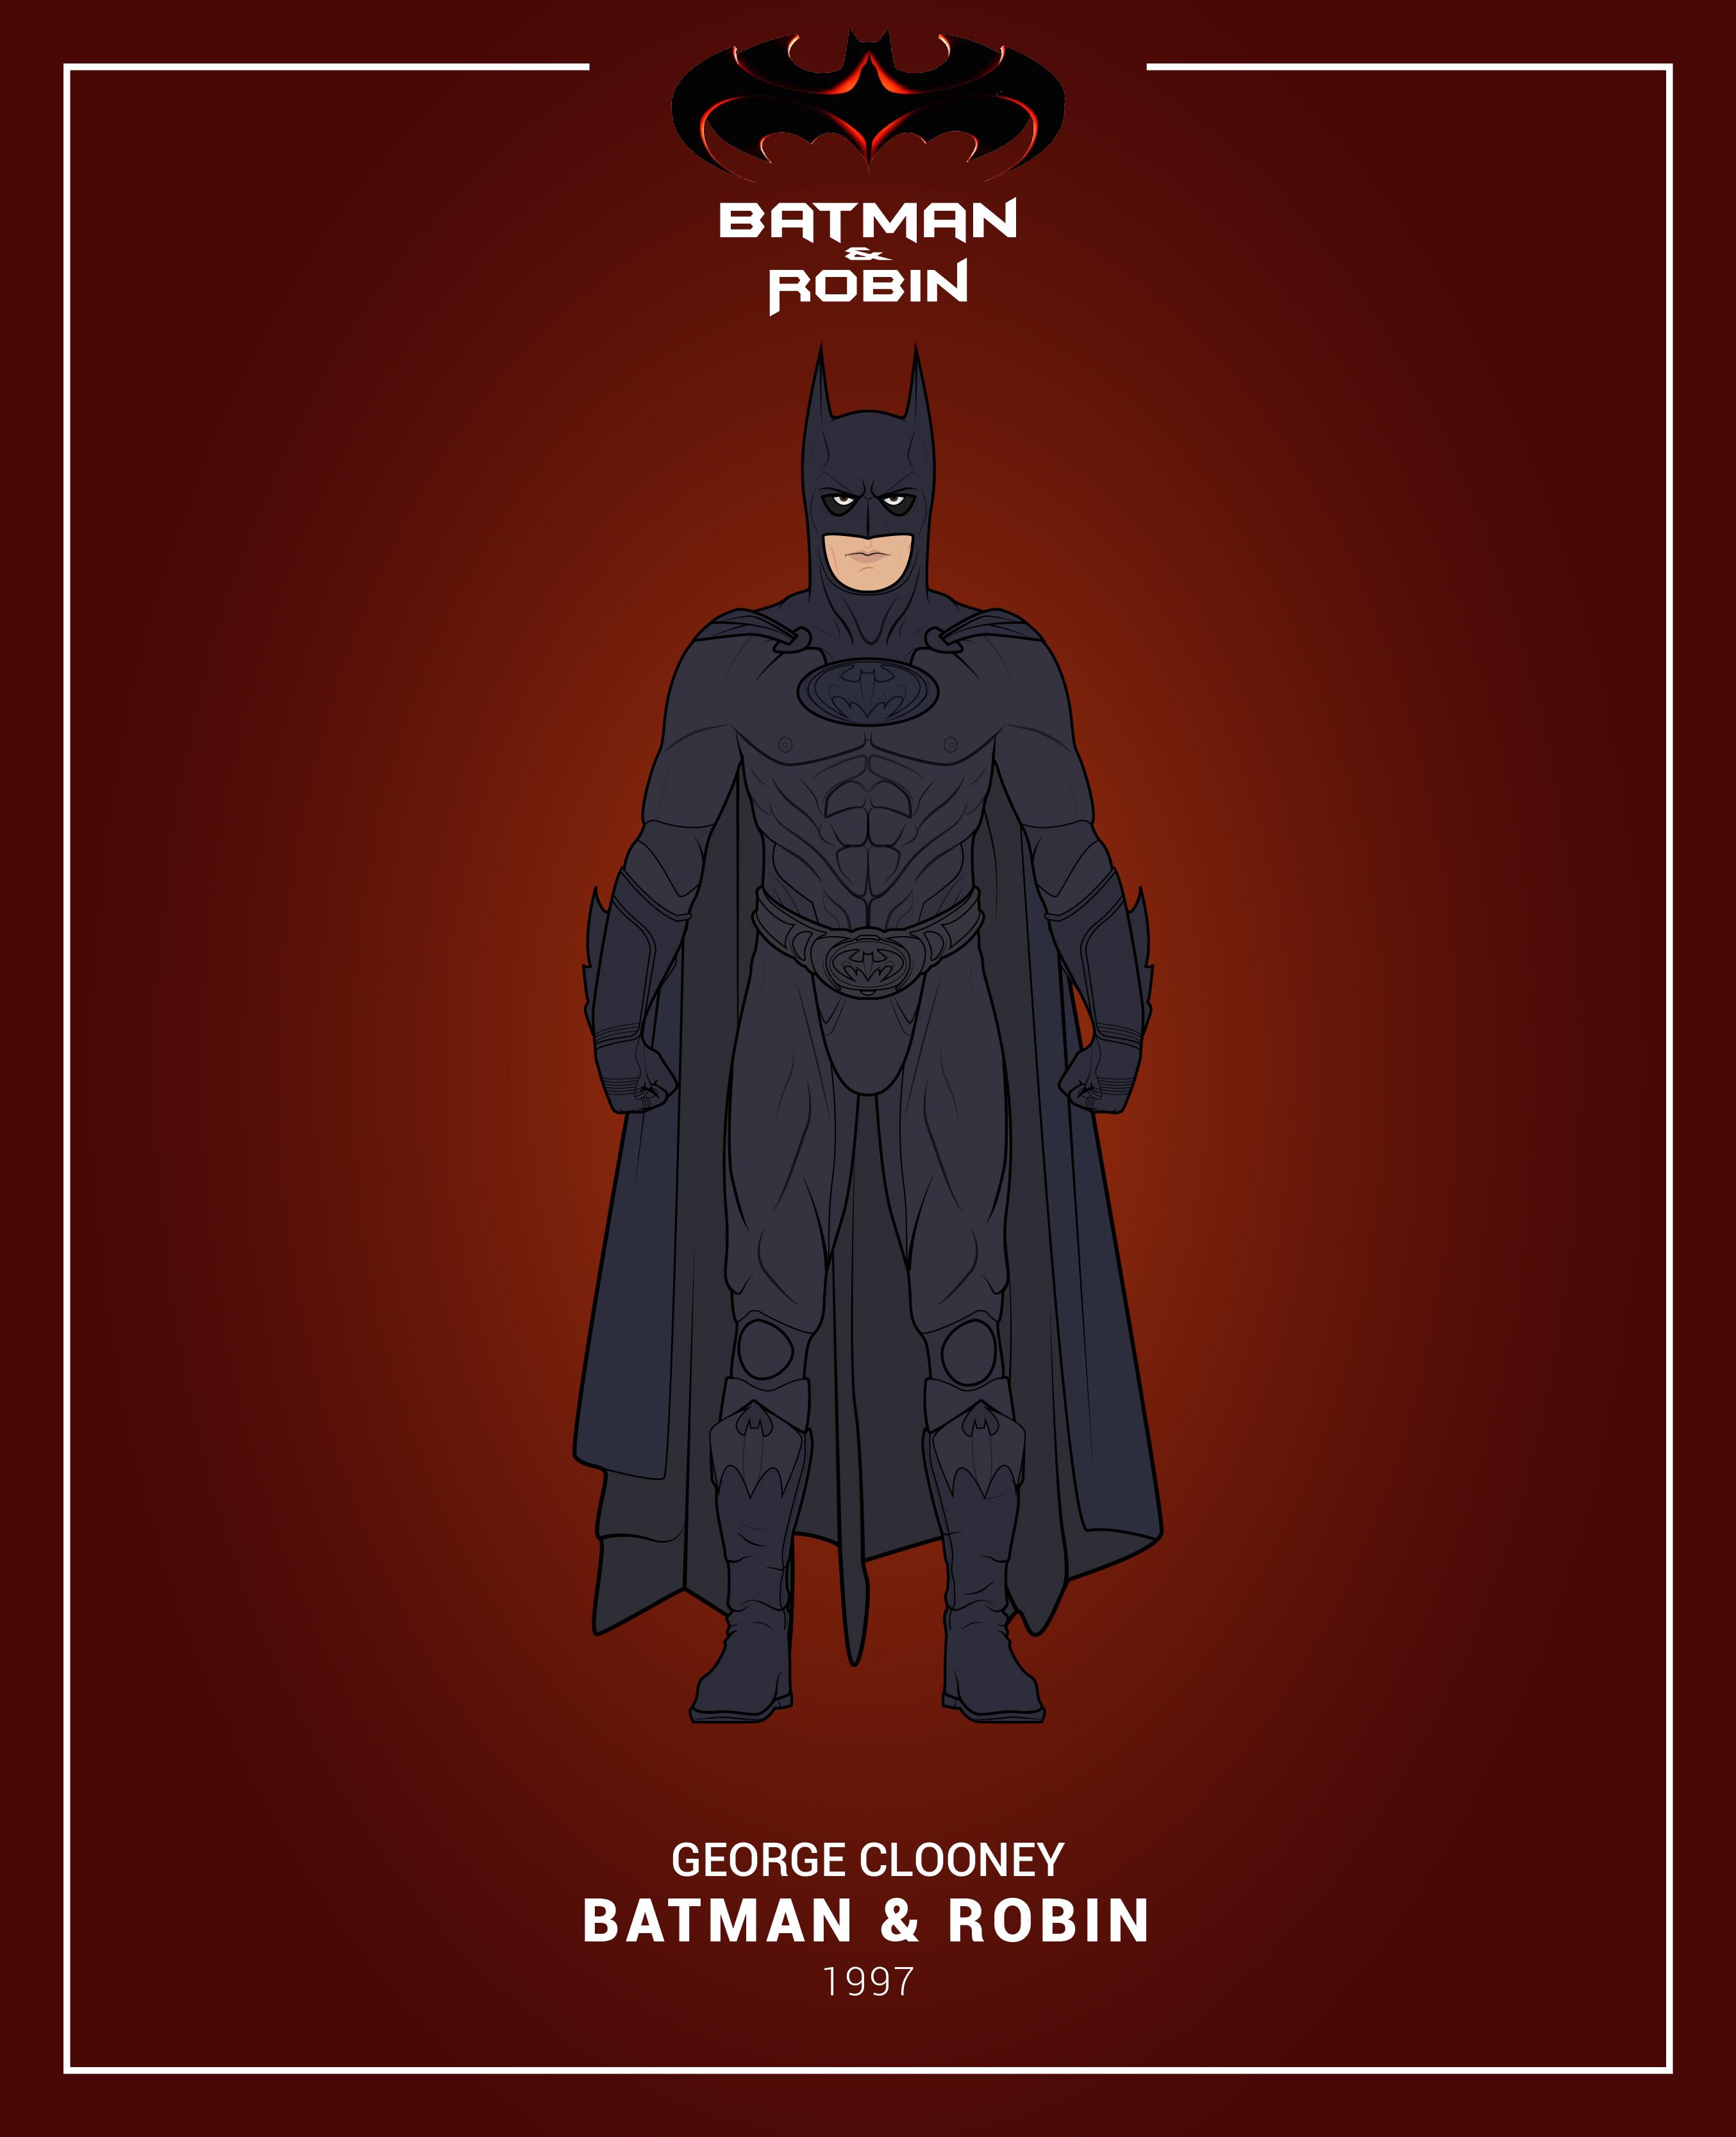 Batman And Robin 1997 By Efrajoey1 On Deviantart